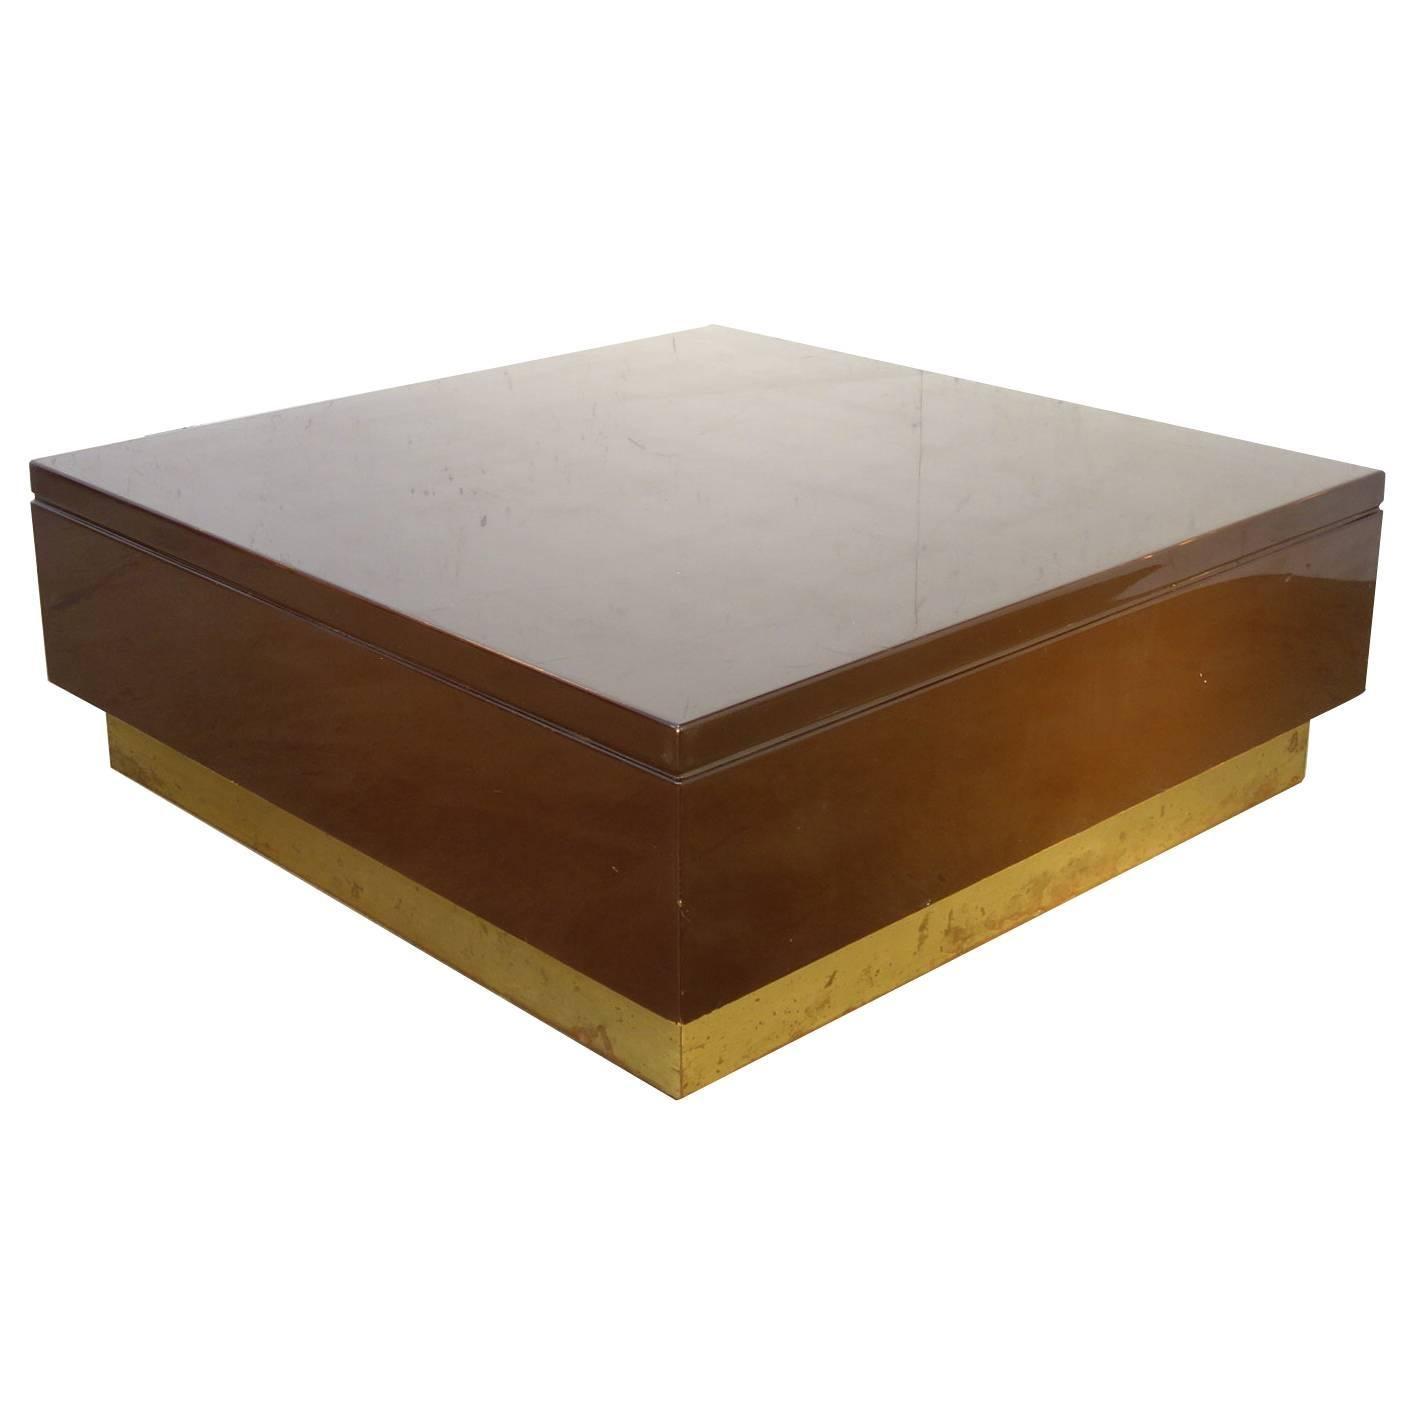 Italian Mid-Century 1970s Occasional Square Laquered Table